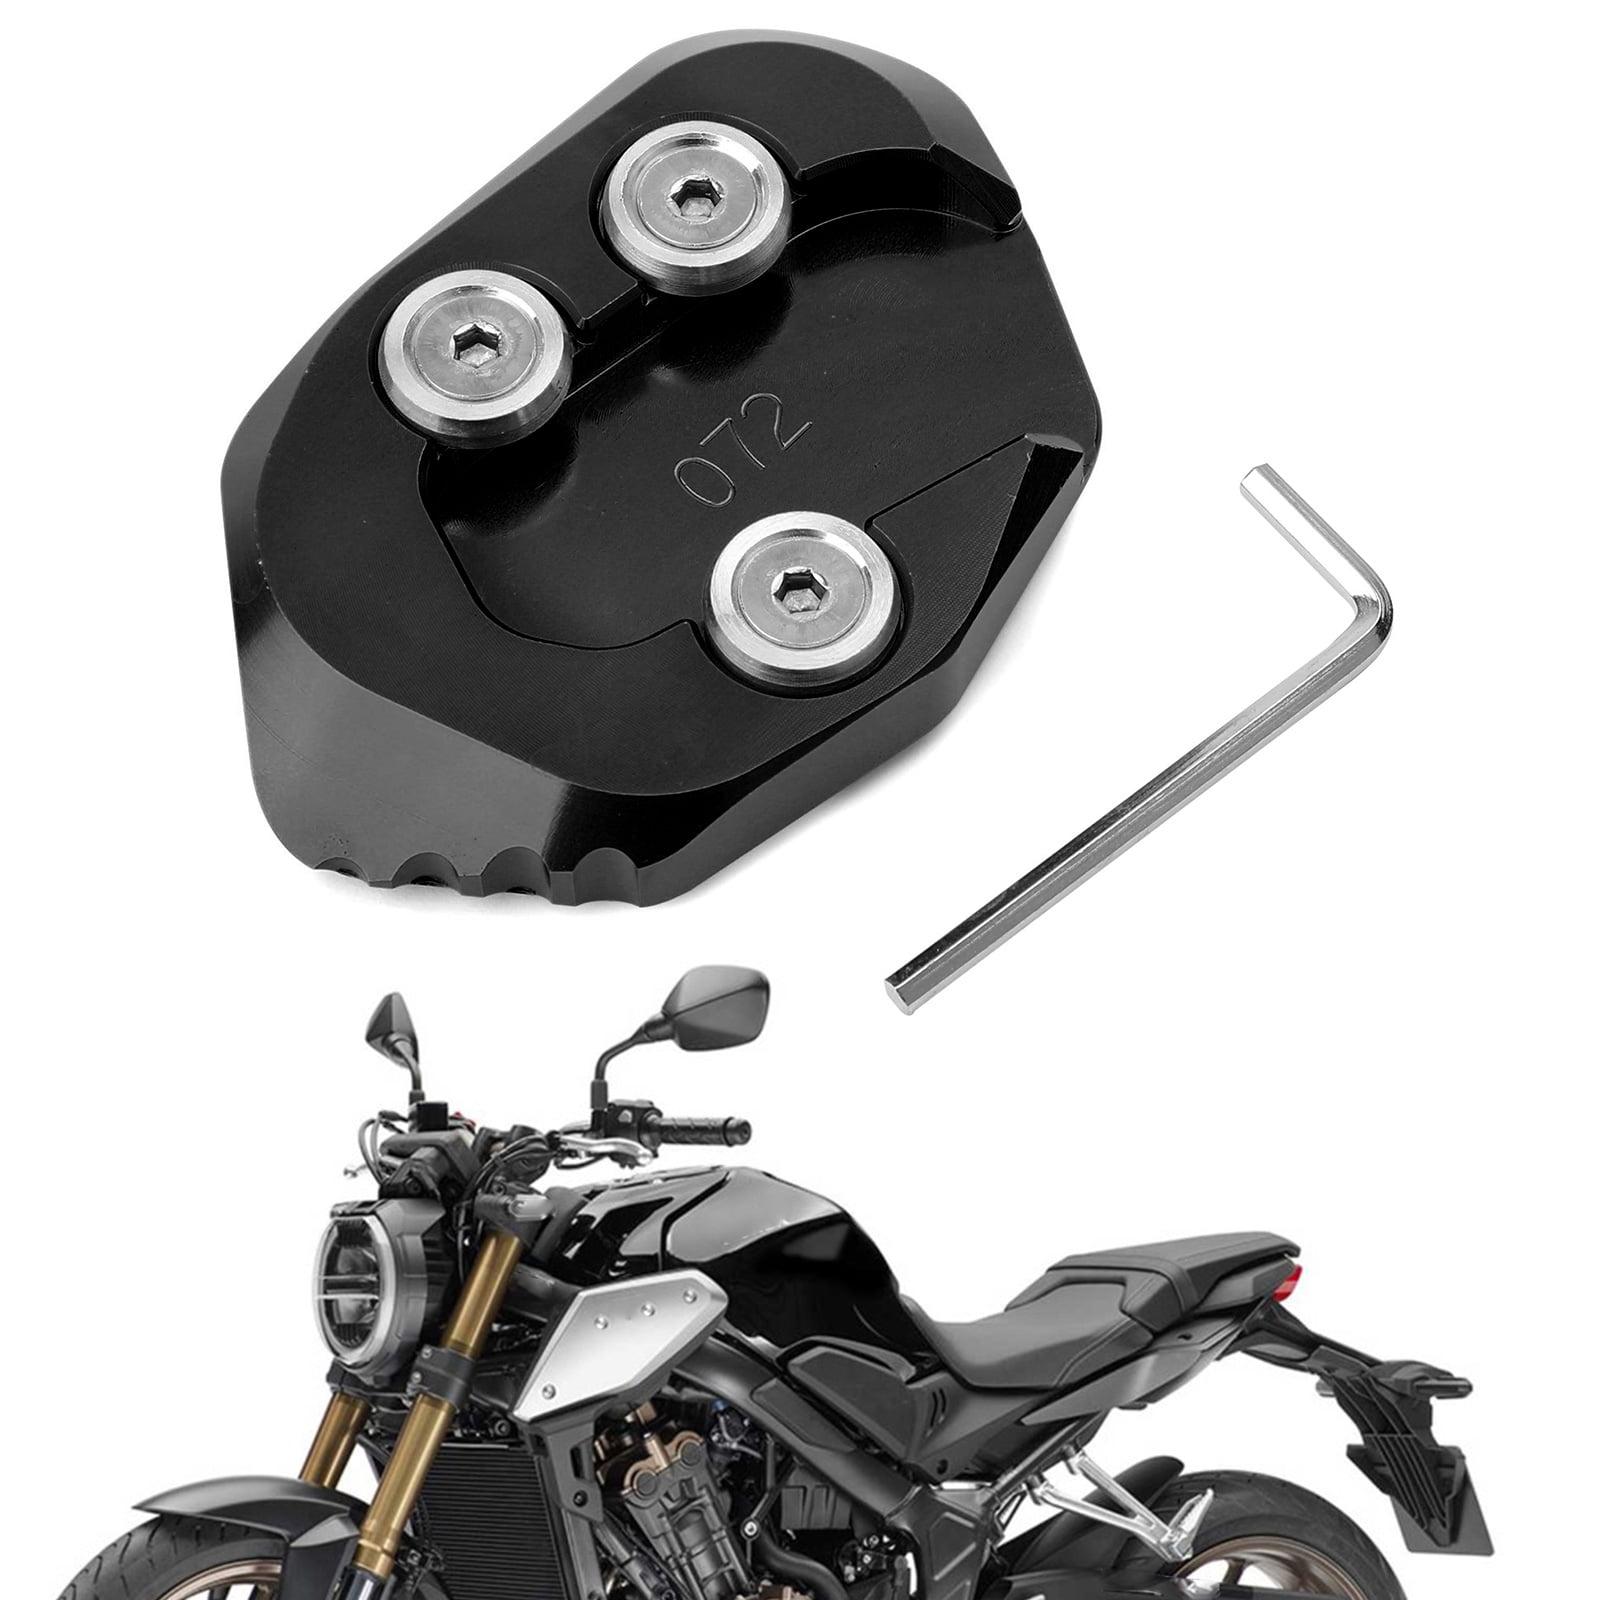 Motorbike Aluminum Alloy Side Stand Extender Enlarger Kickstand for Honda